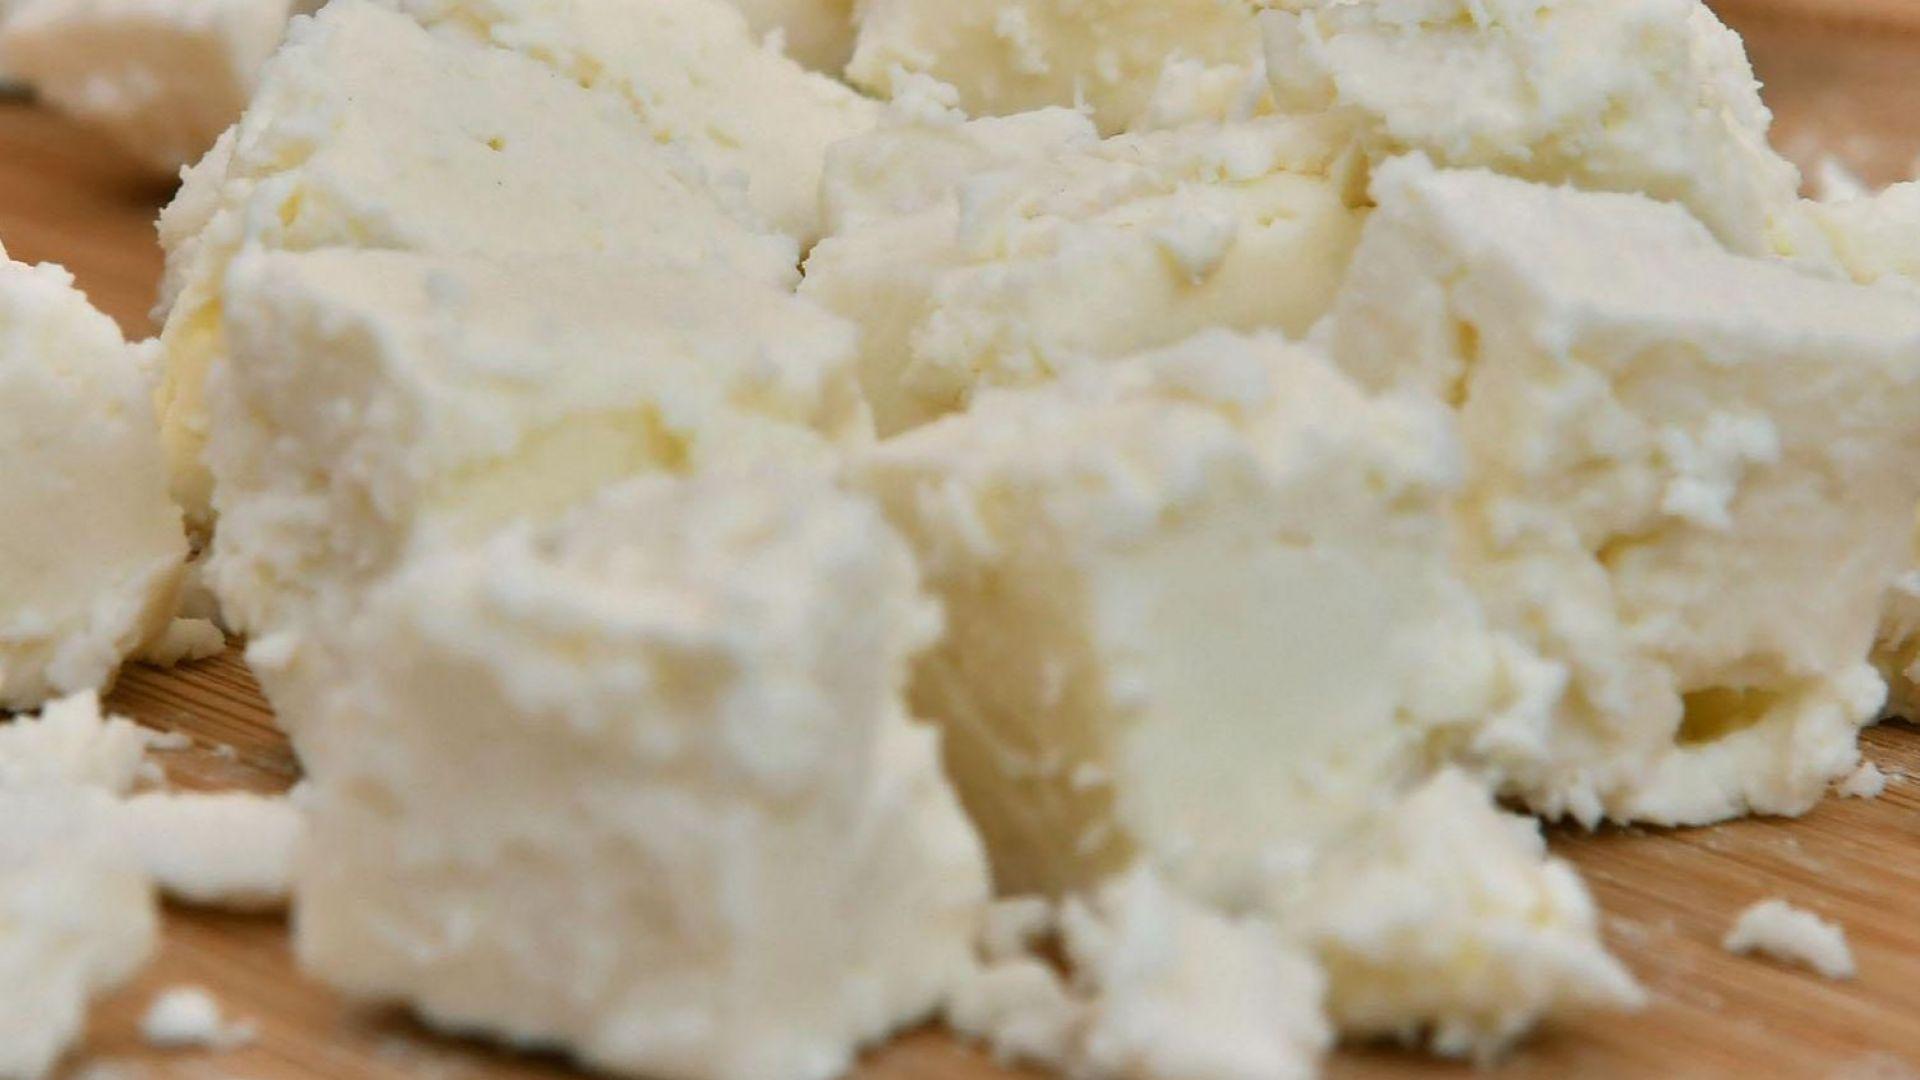 Откриха 600 кг старо сирене, готово за продажба